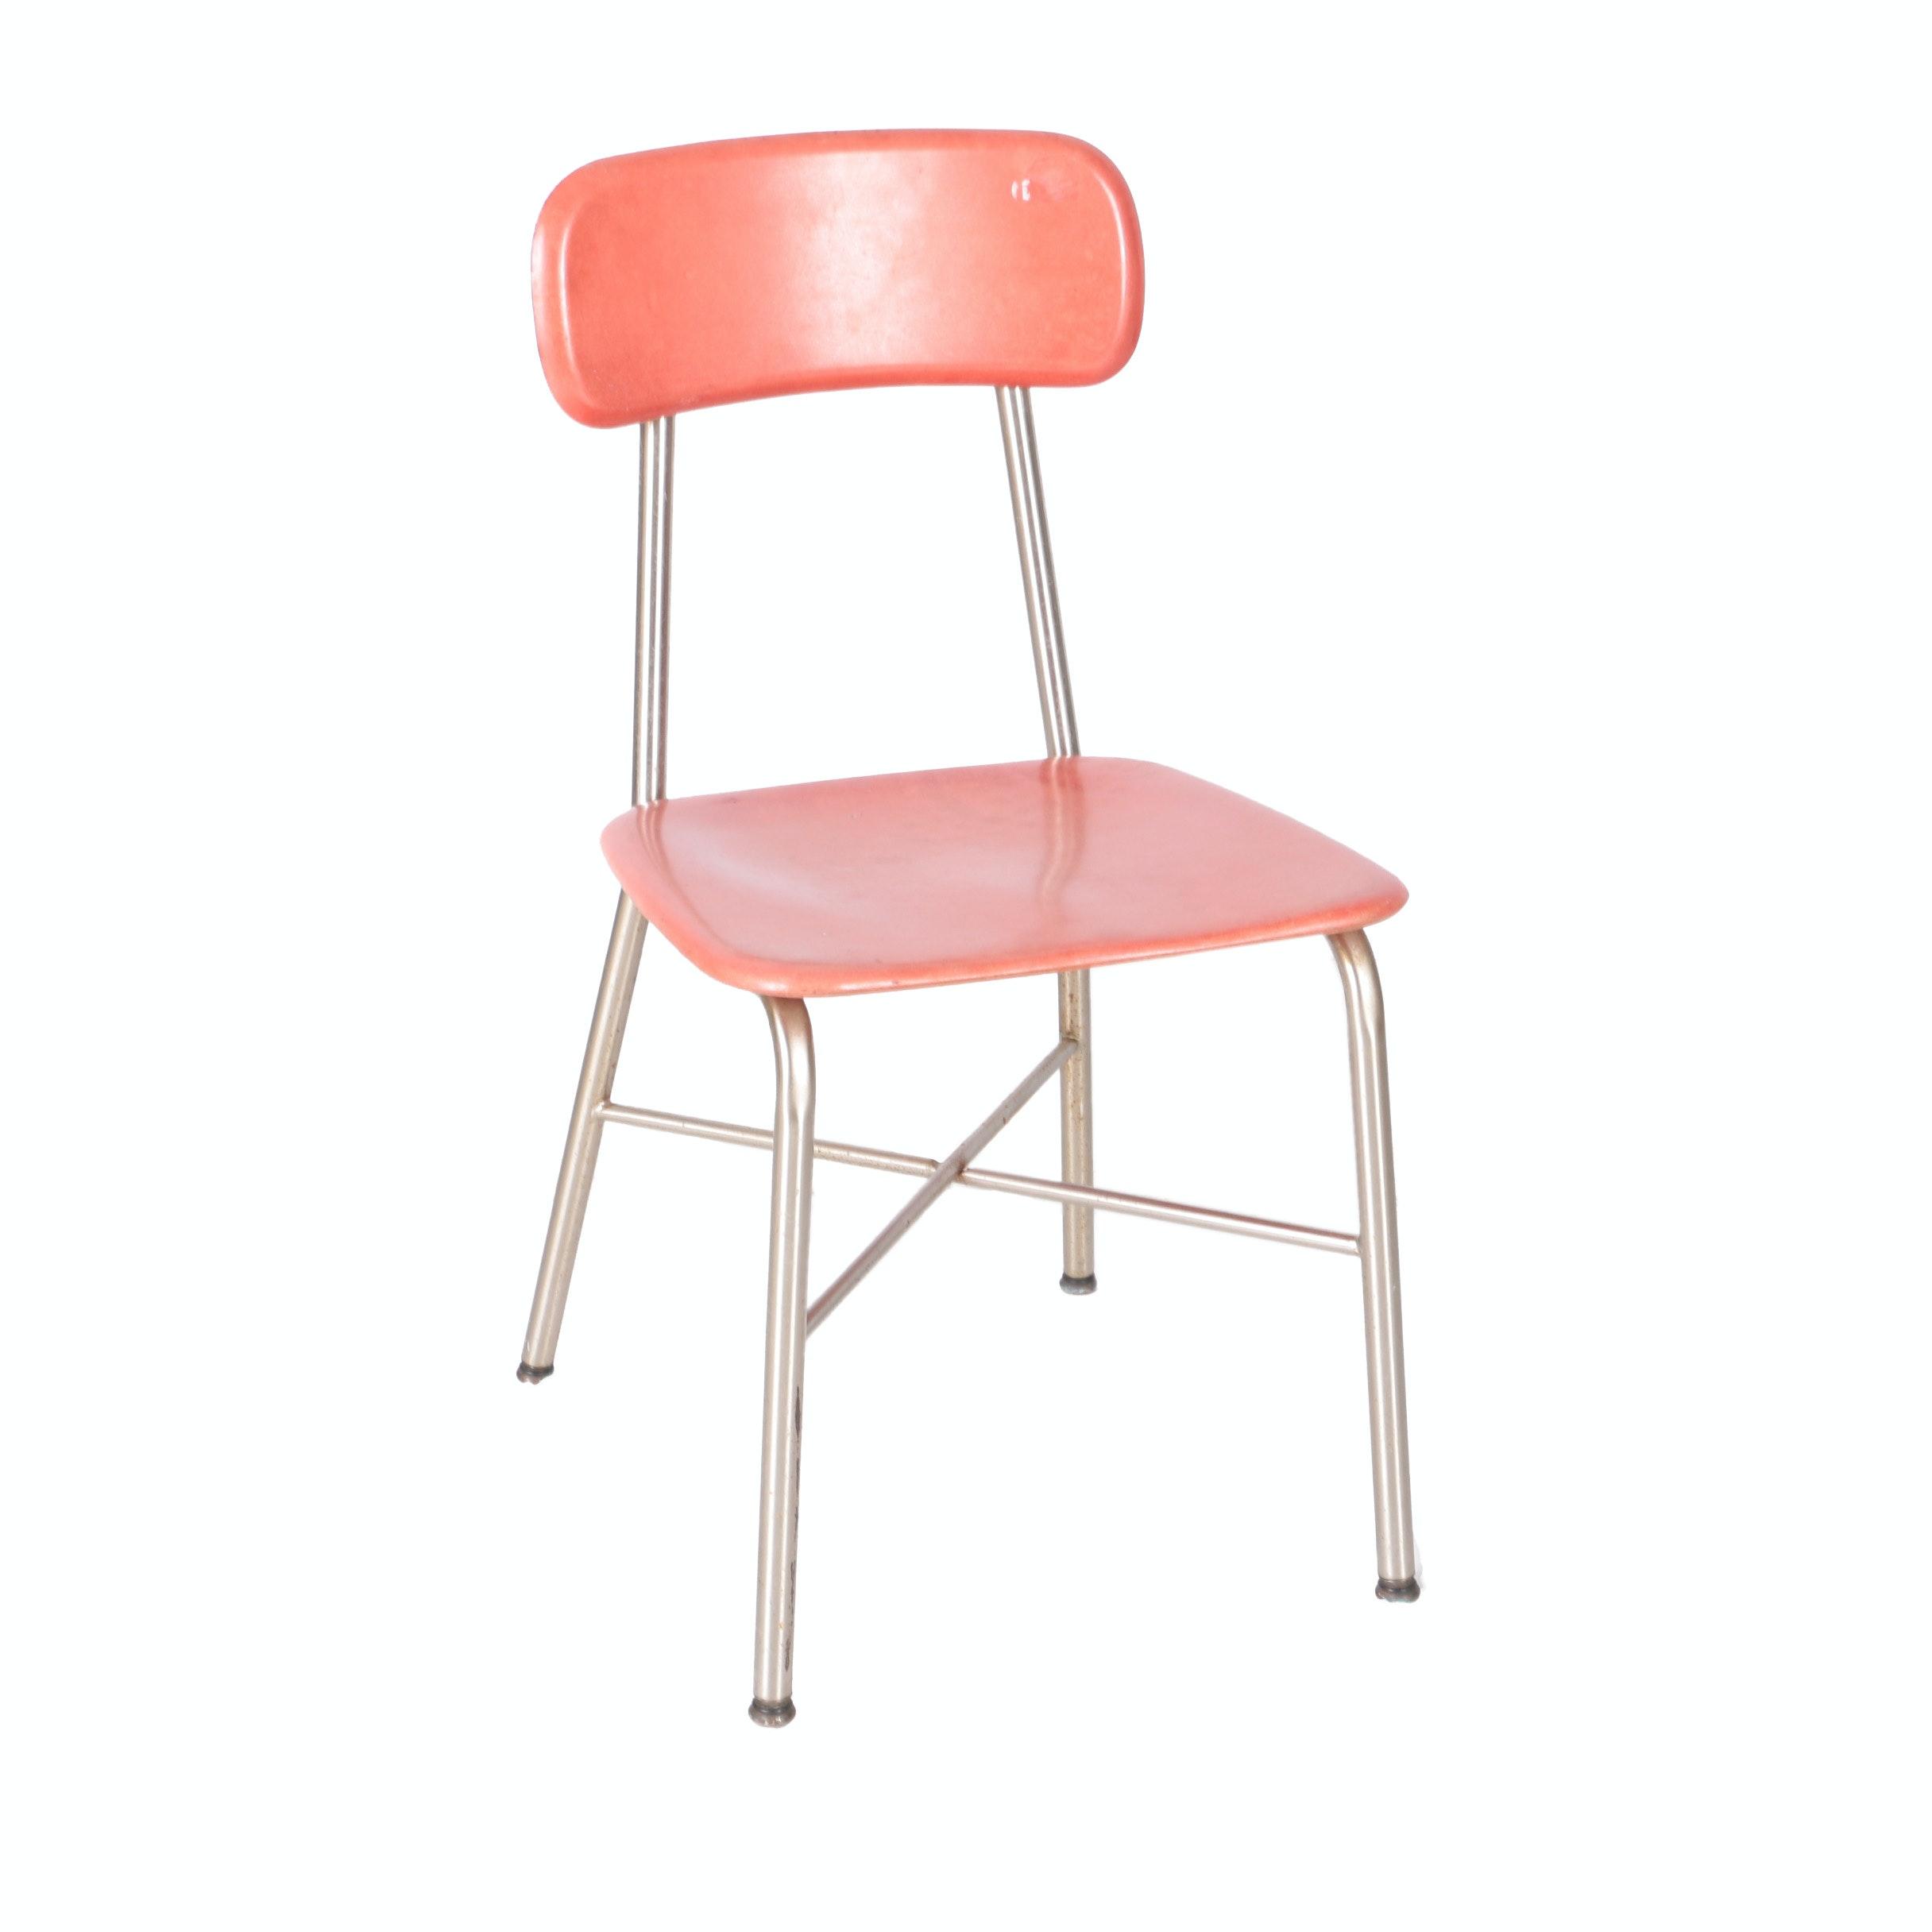 Vintage Mid Century Modern Student Chair by Heywood-Wakefield